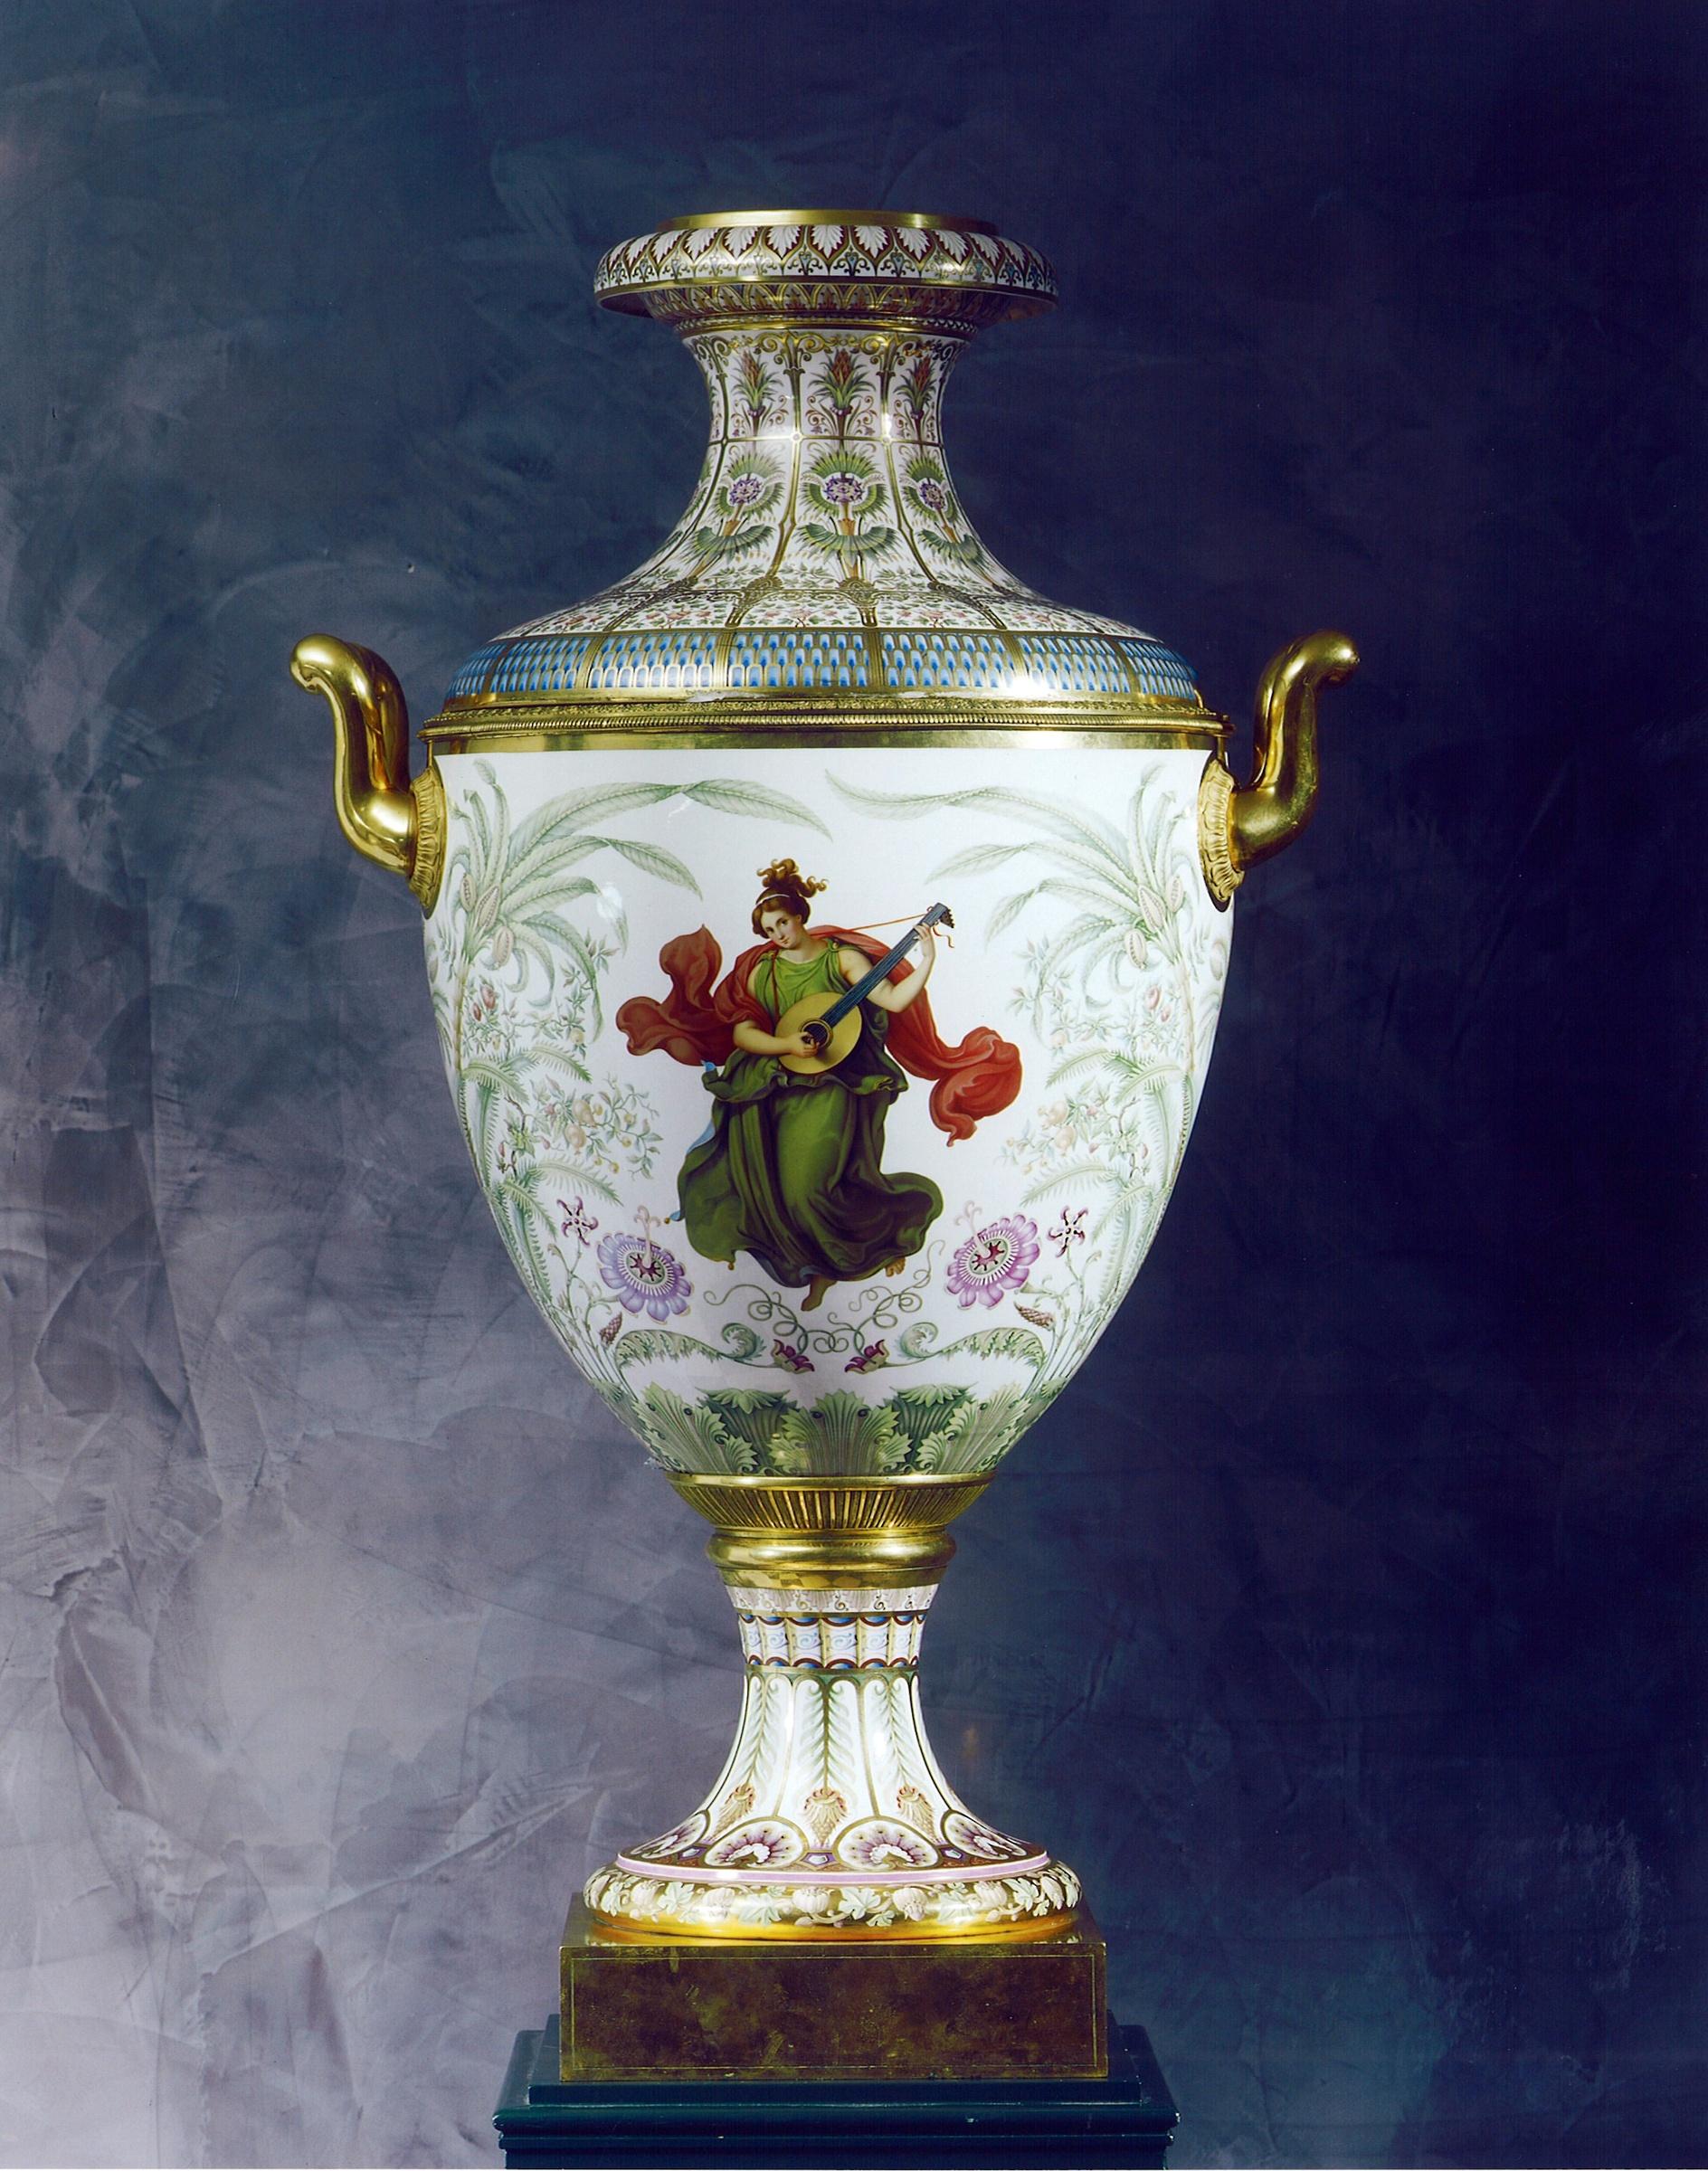 k p m k nigliche porzellan manufaktur berlin a classical munich vase sorte no 4 made by the. Black Bedroom Furniture Sets. Home Design Ideas